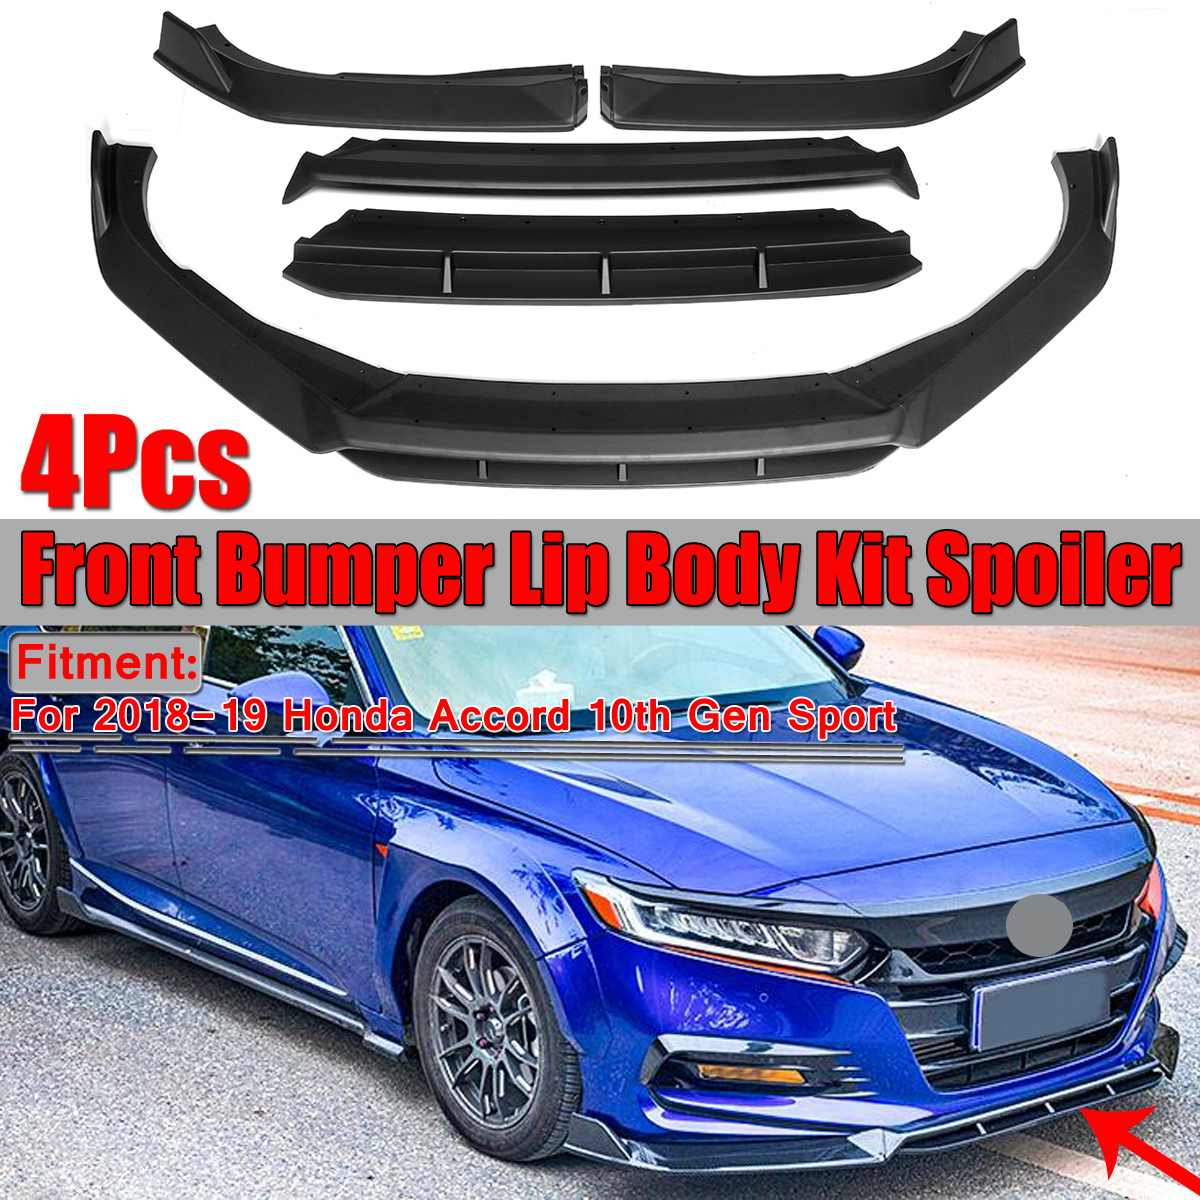 4 stück Auto Front Lip Splitter Körper Kit Spoiler Splitter Frontschürze Lip Für Honda Für Accord 10th 2018 2019 Gen Sport